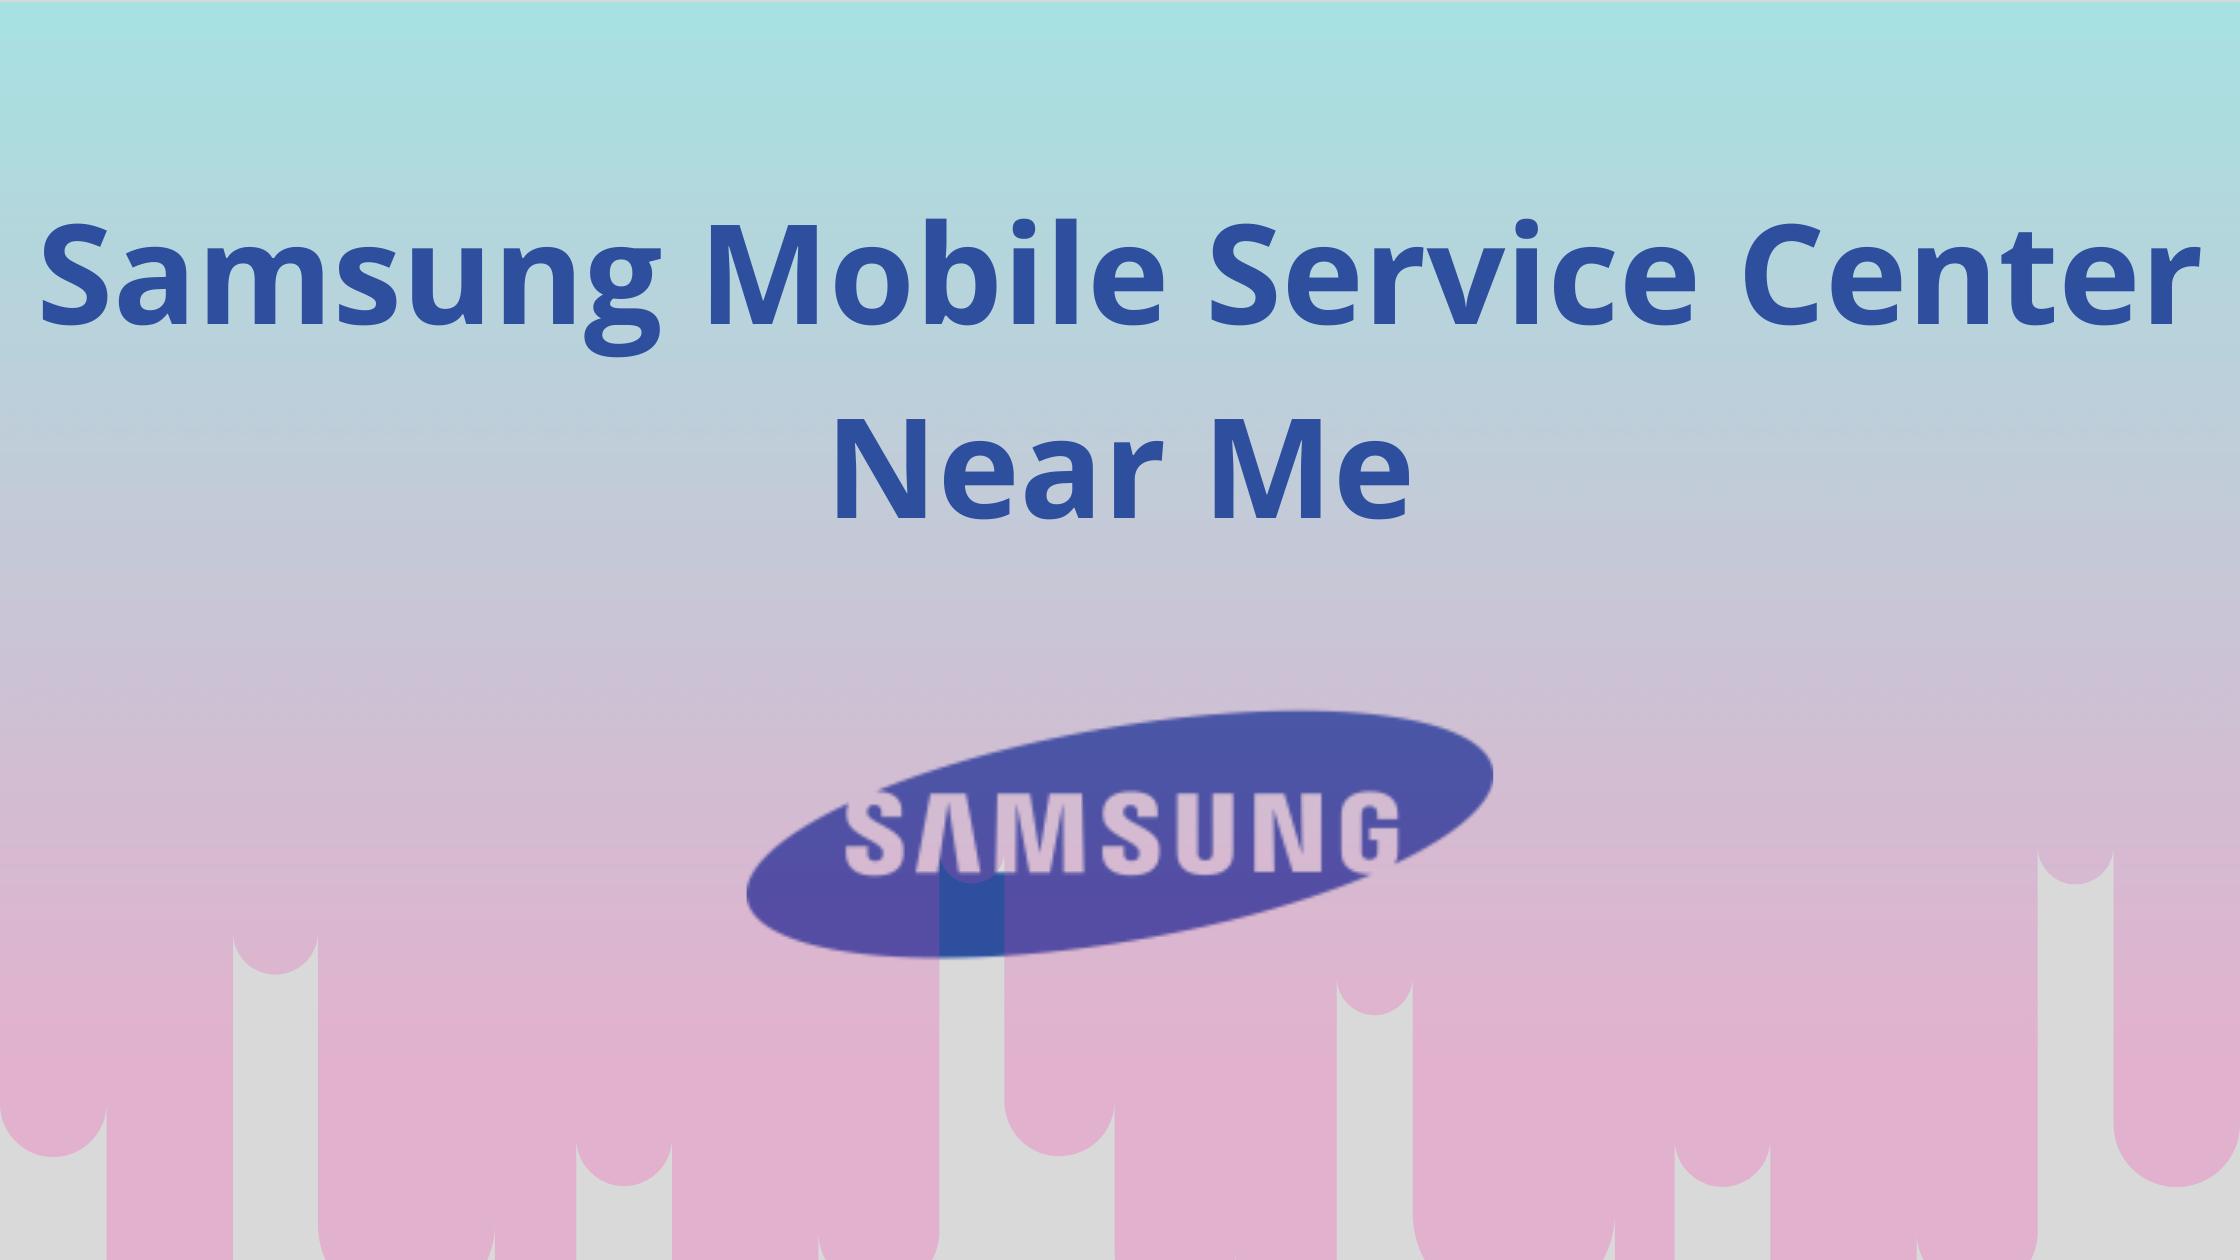 Samsung Mobile Service Center Near Me